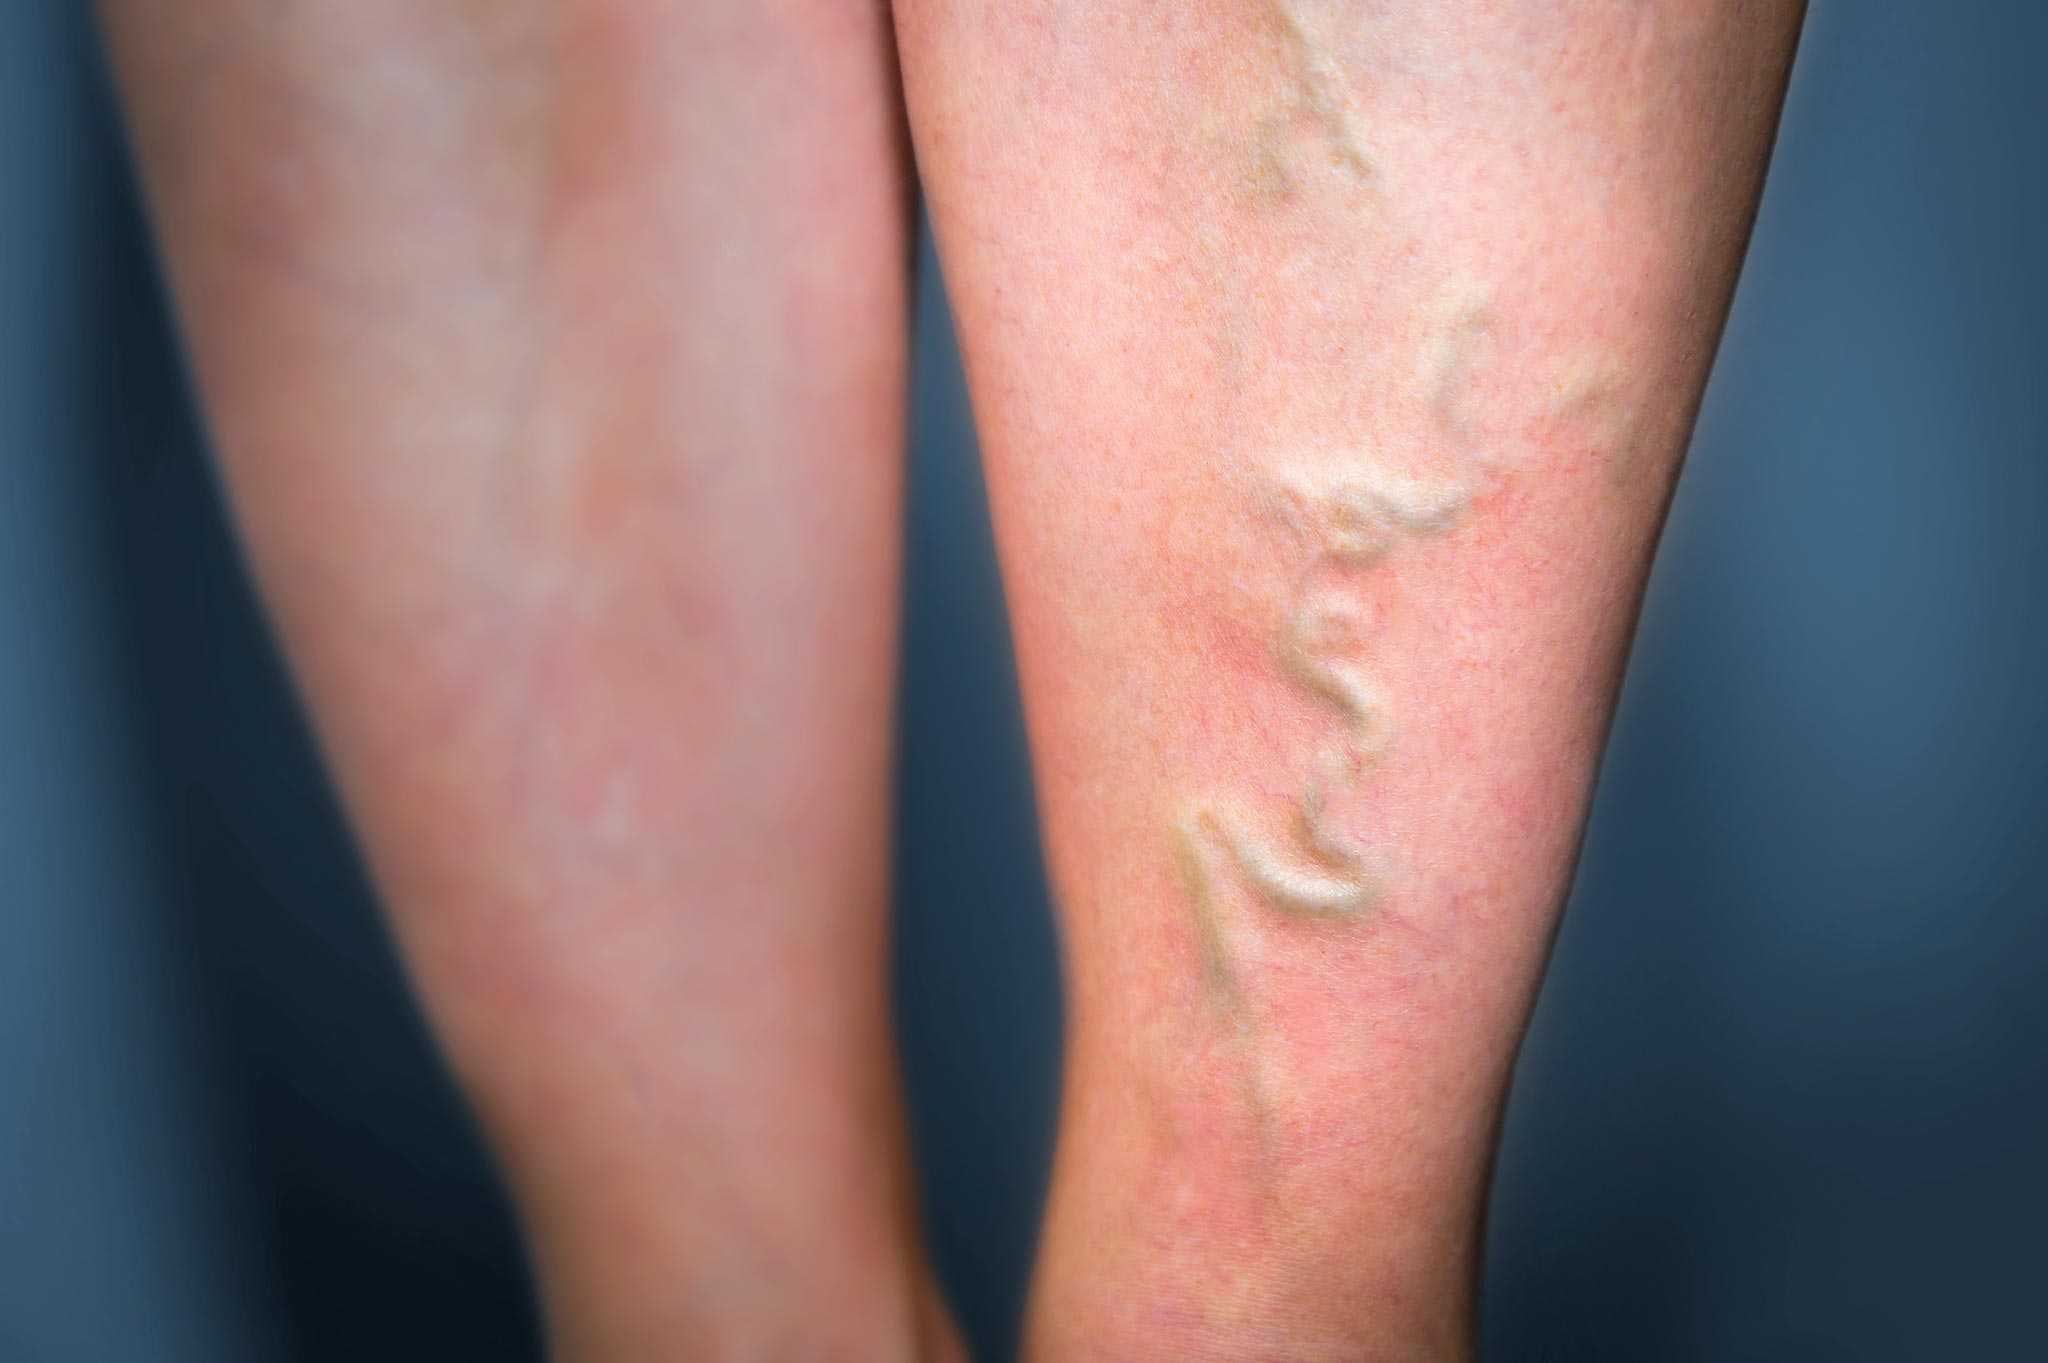 thrombose ursachen symptome